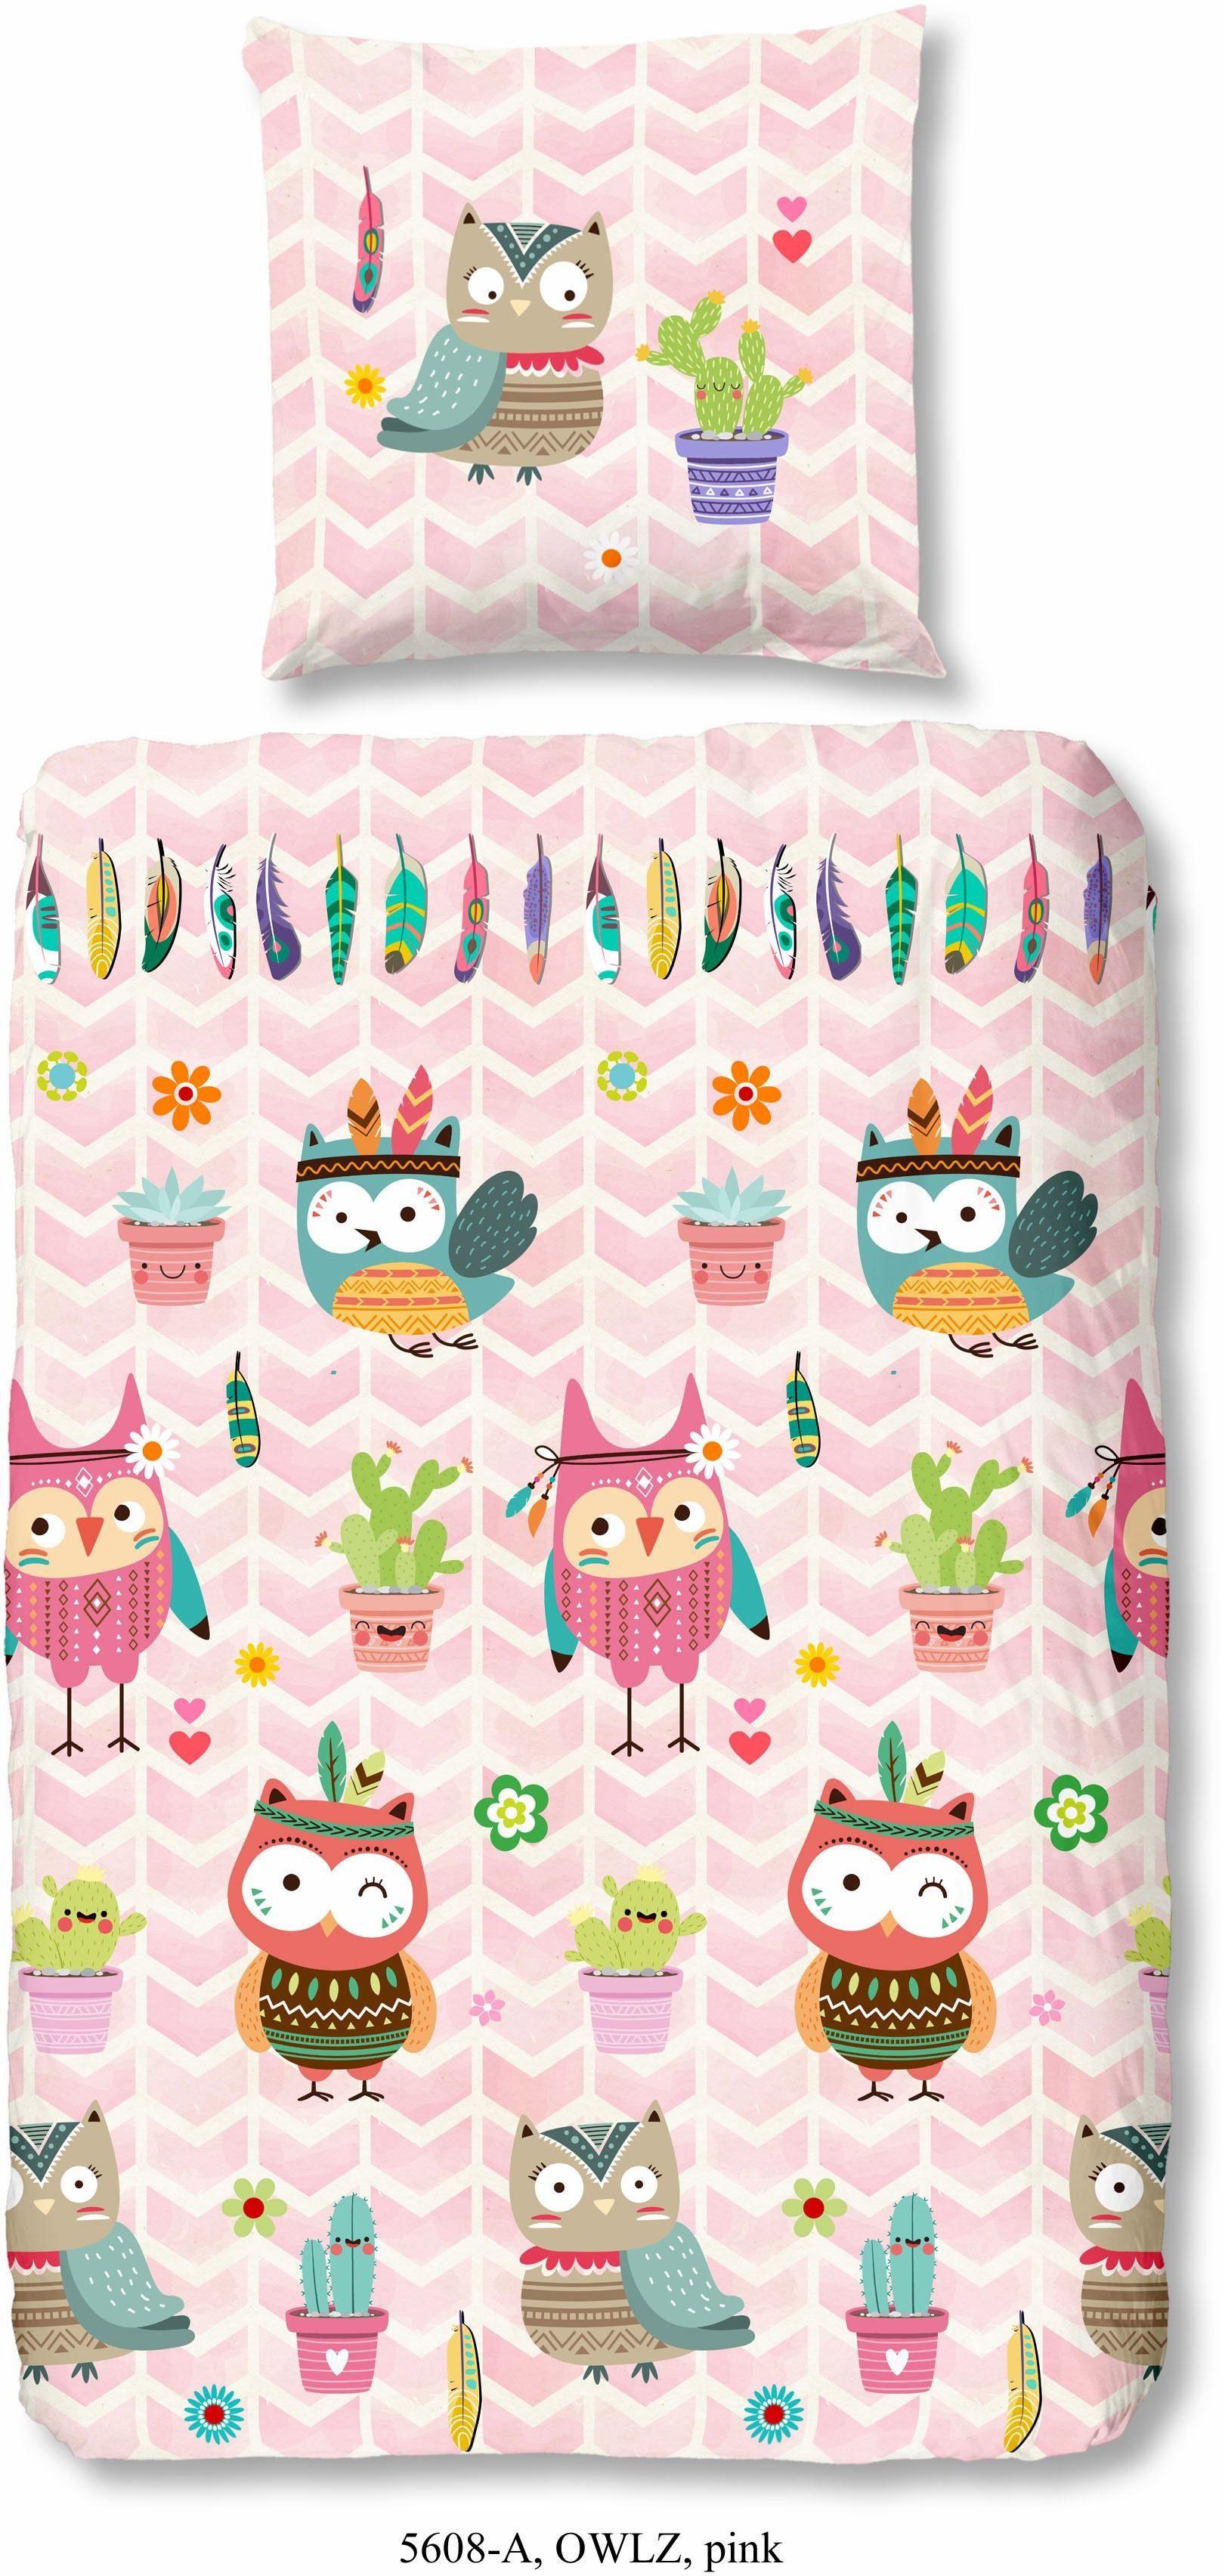 Kinderbettwäsche »Owlz«, good morning, mit Eulenmotiv